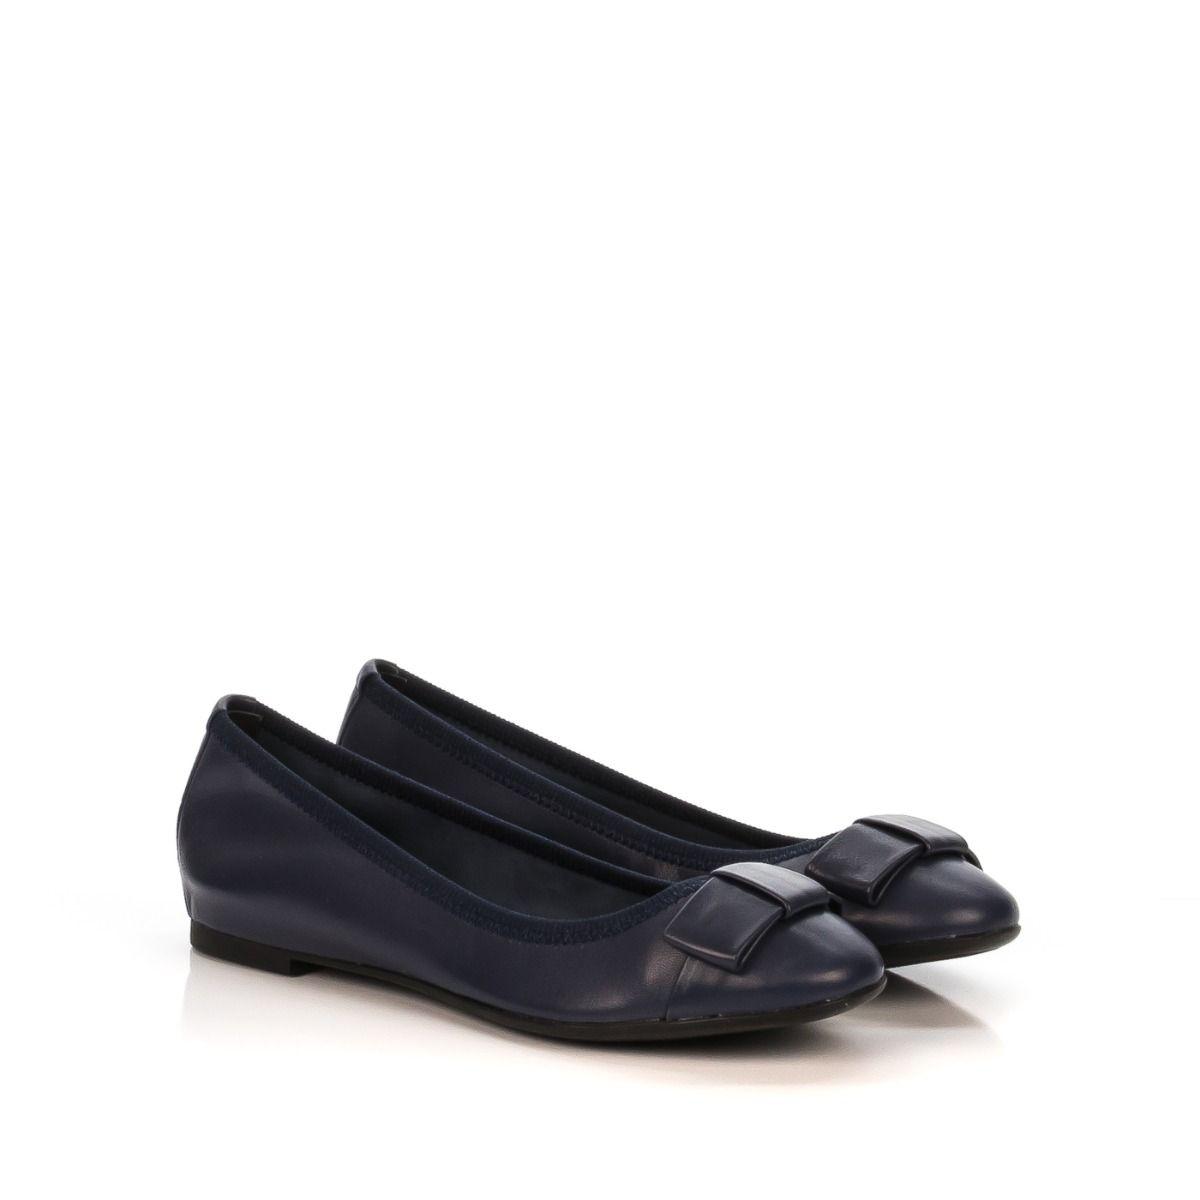 online store 27841 b8145 70l2-ballerina-blu 2 .jpg